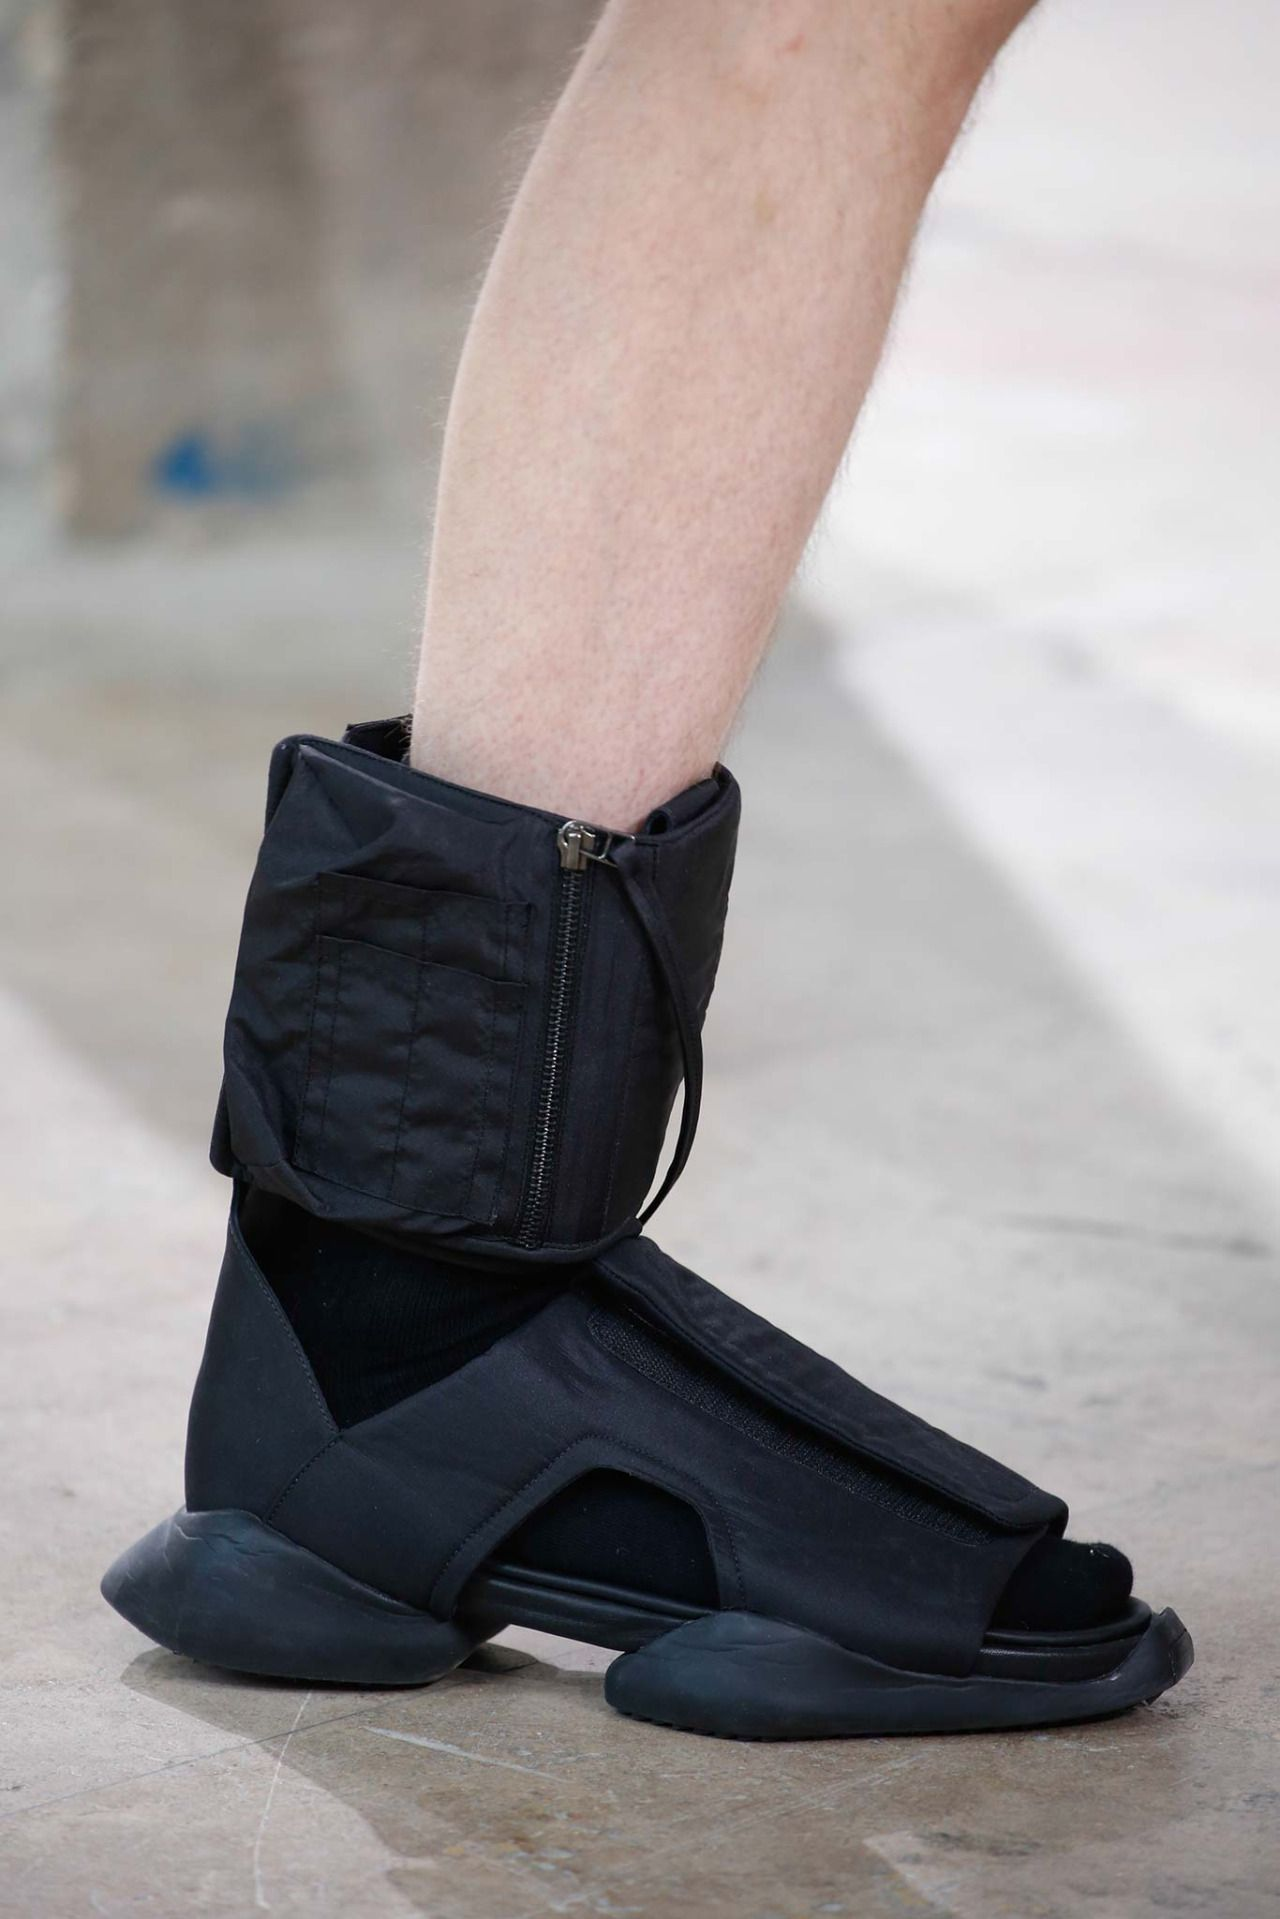 Rick Owens X Adidas Spring 2016 Menswear Adidas Sandals Shoelust